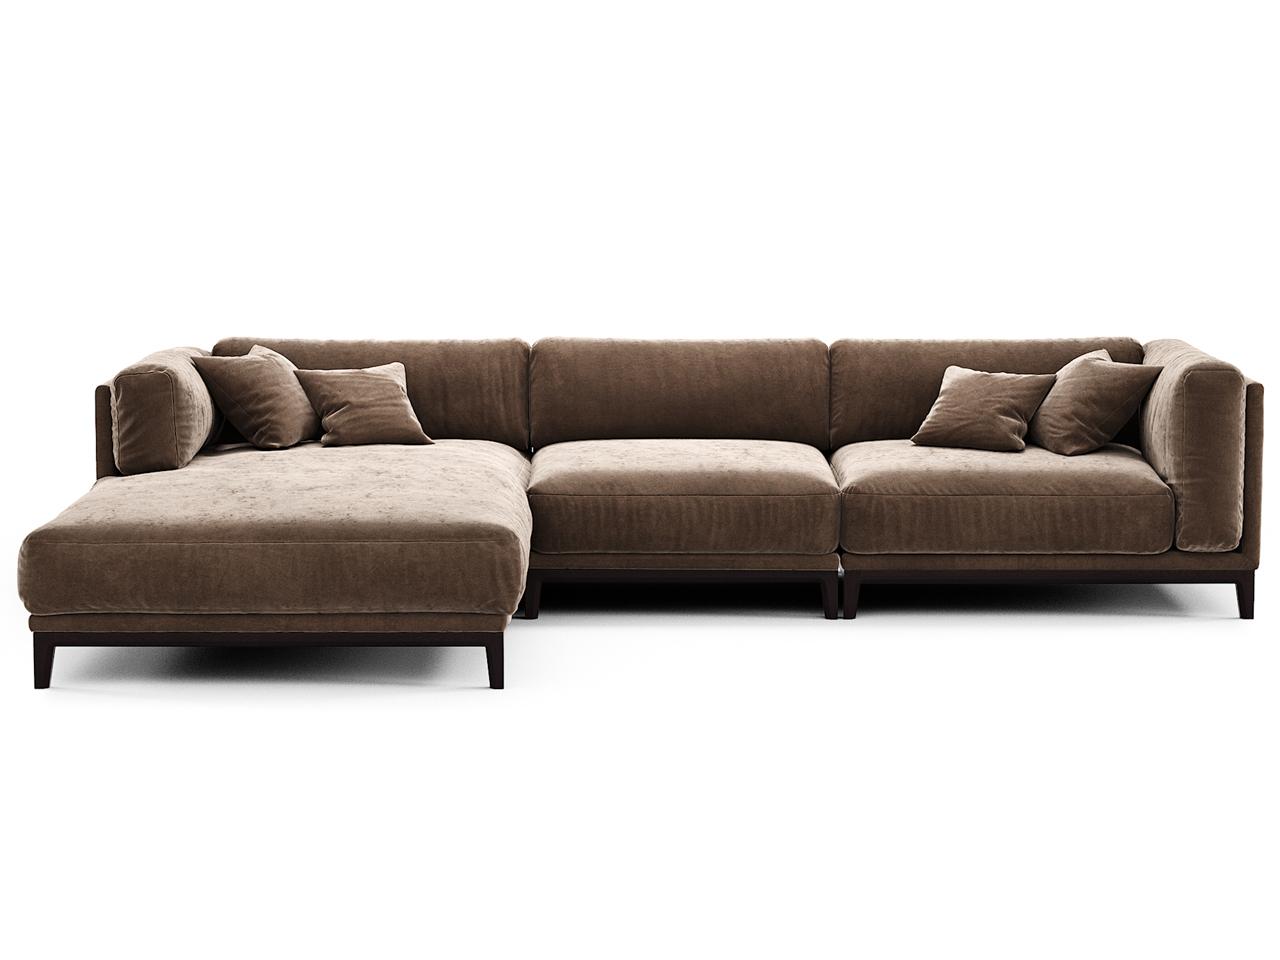 The idea диван case коричневый 108258/3